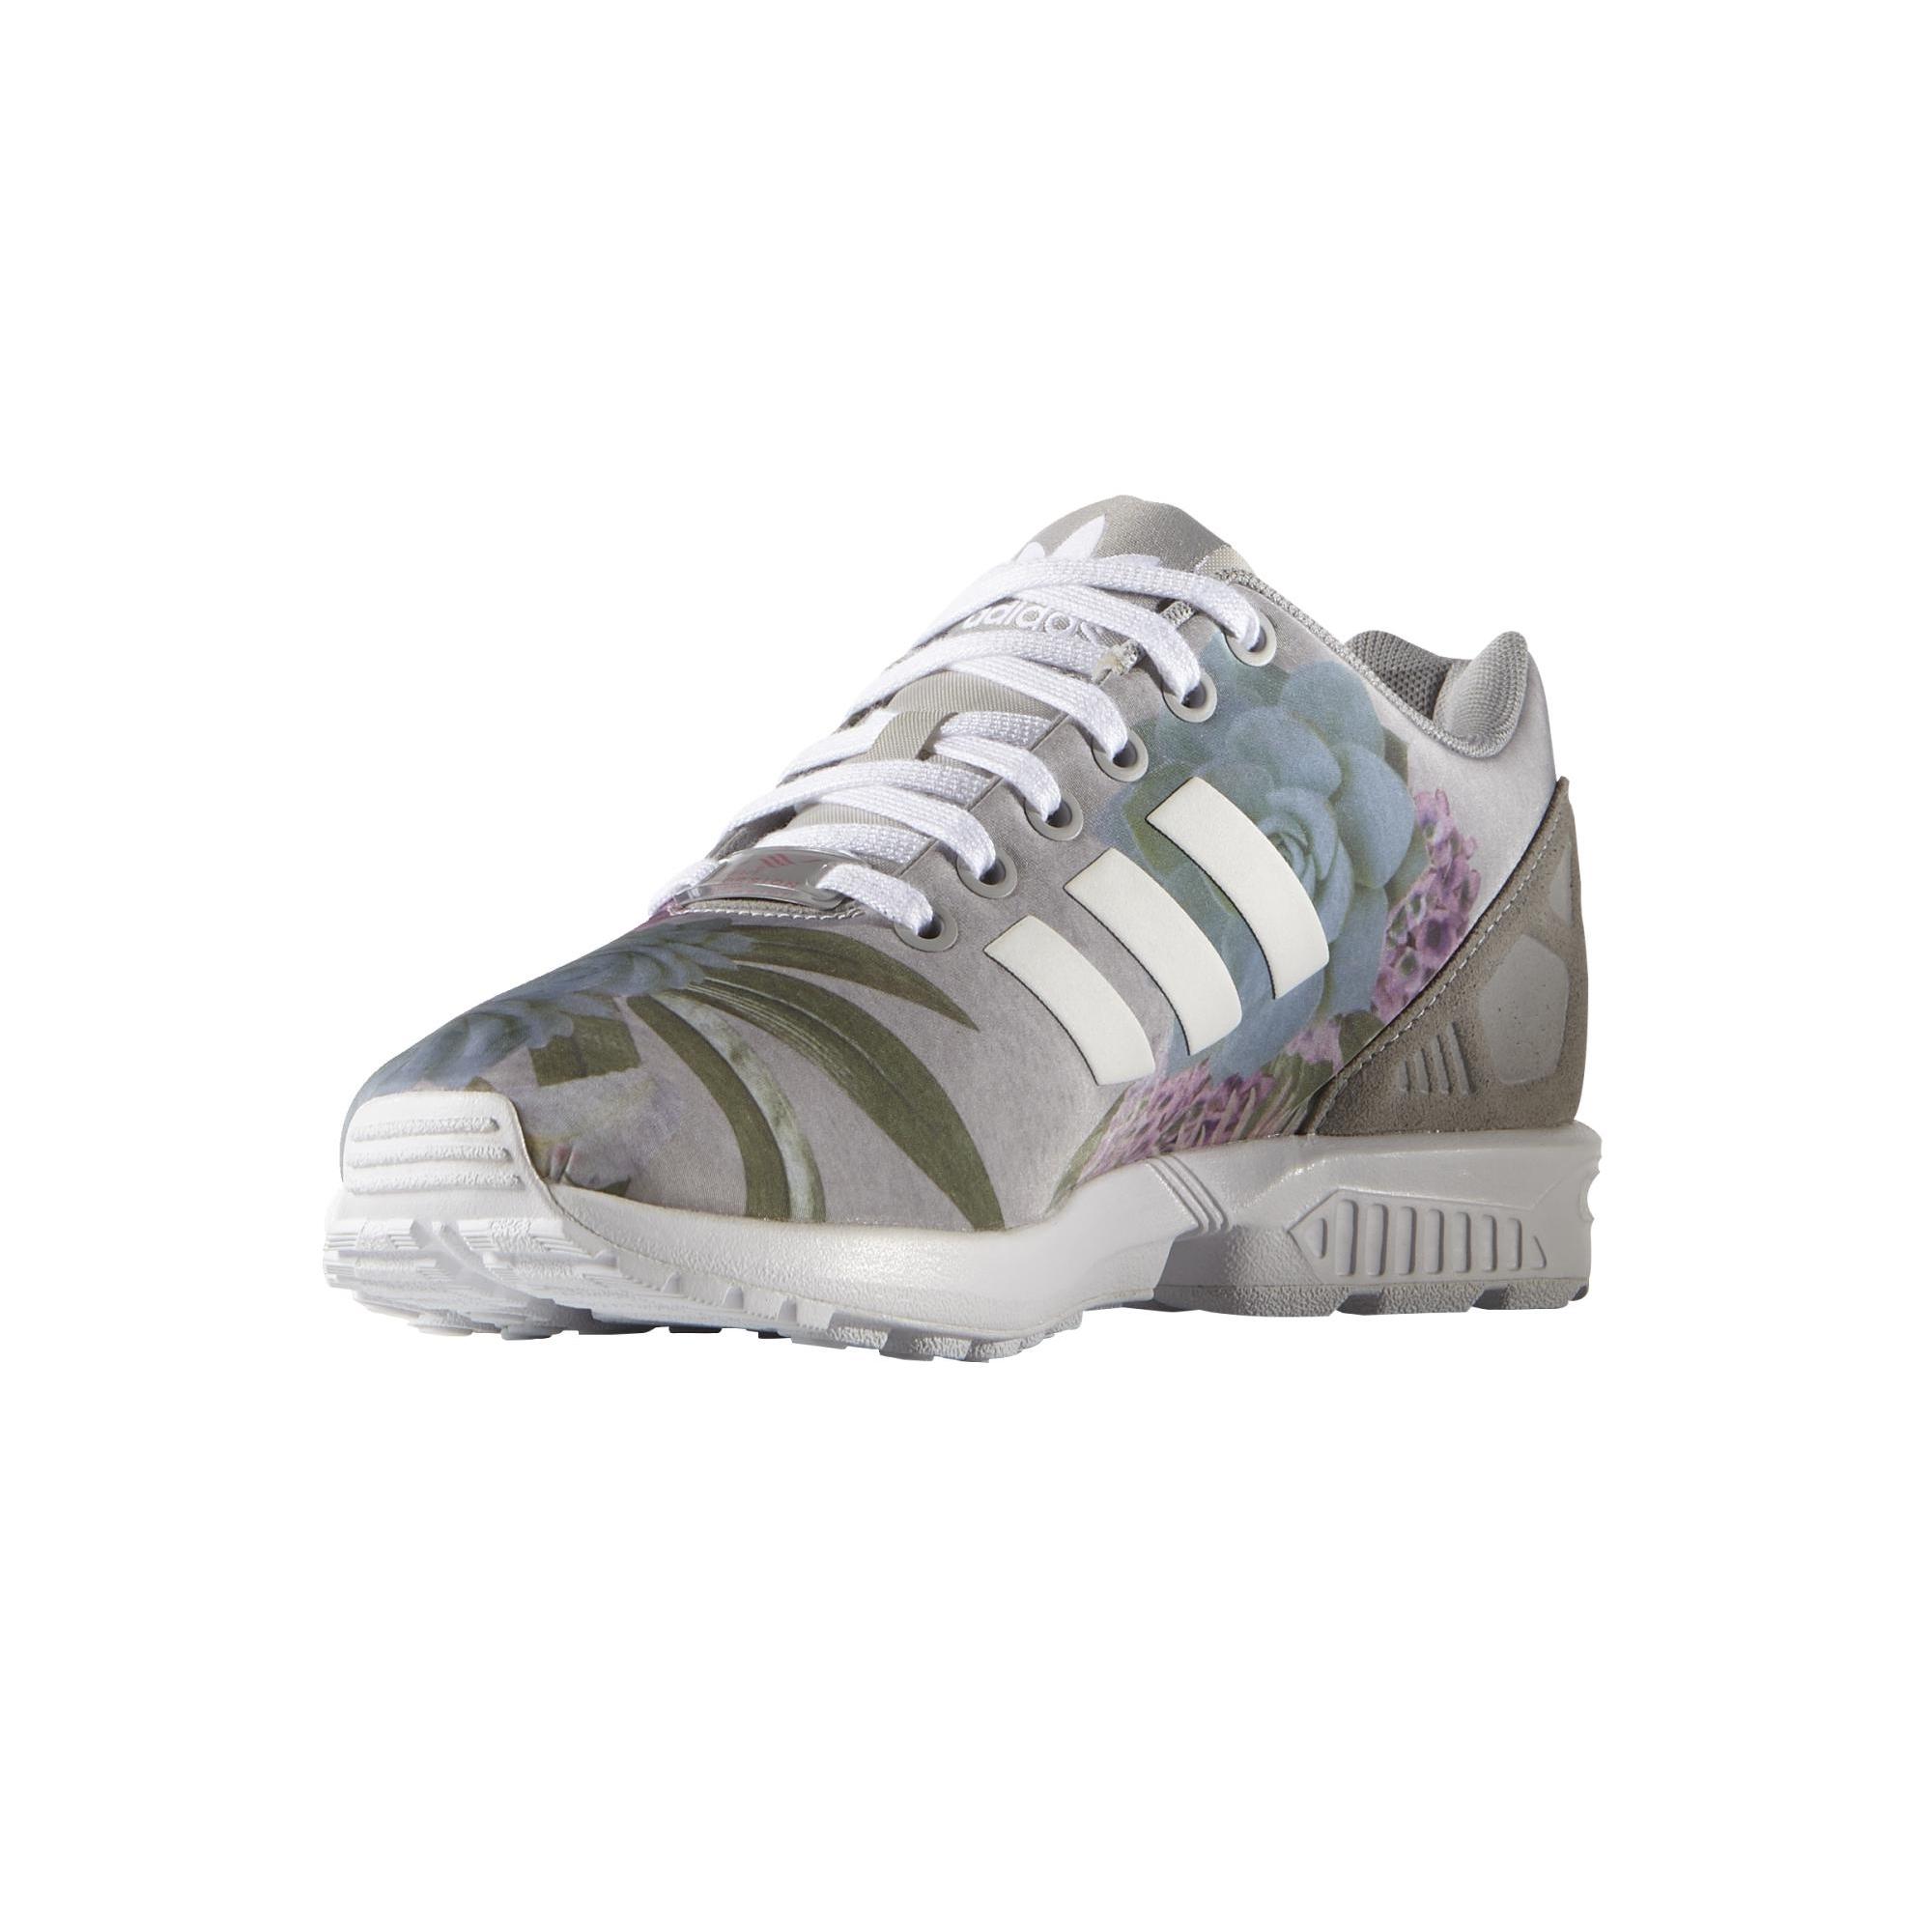 1f4fab051 Adidas Originals Mujer ZX Flux